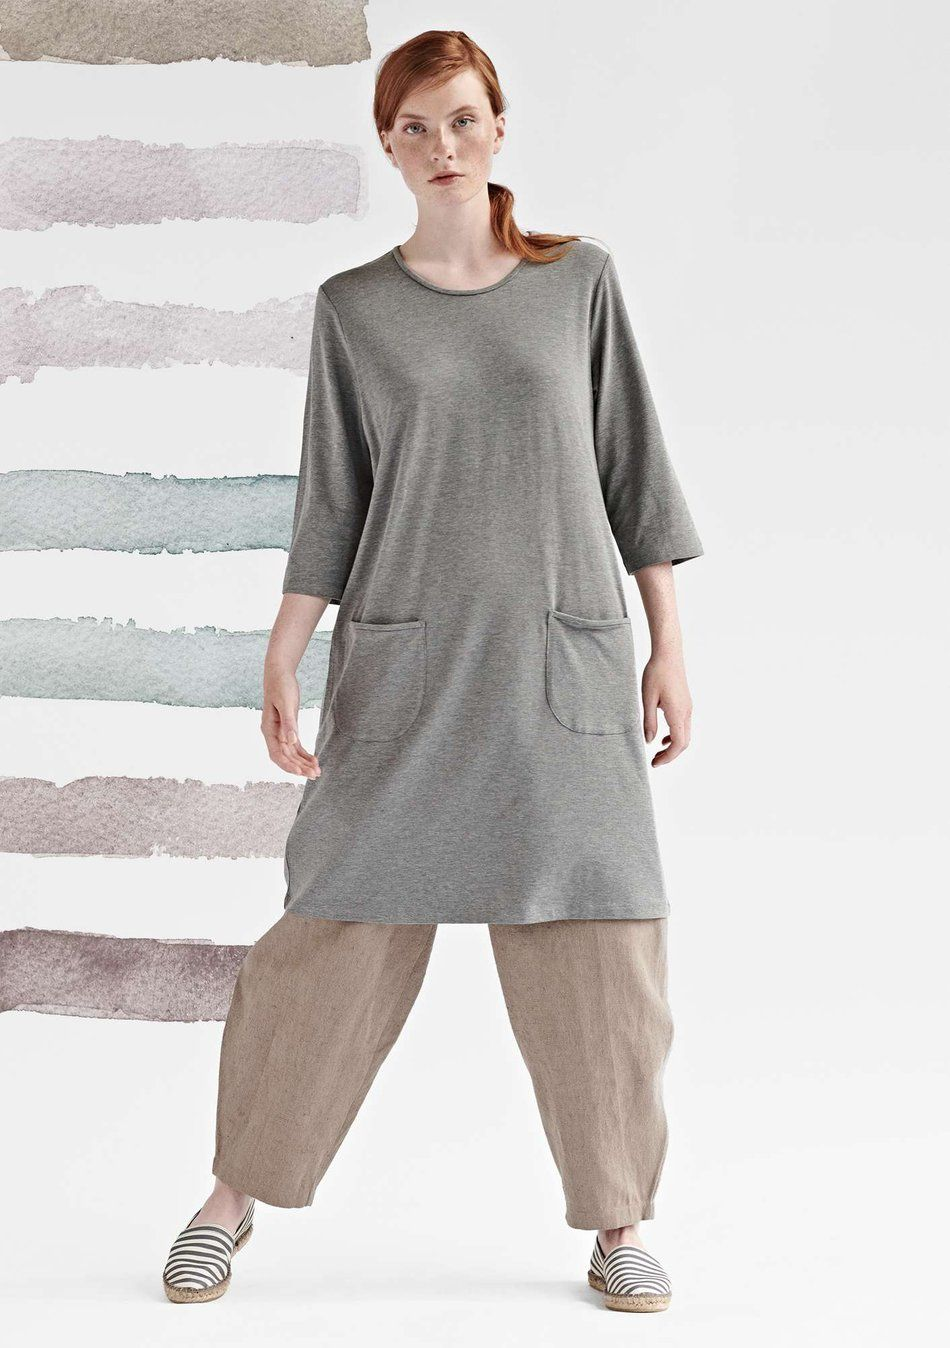 815f3163 Kjole DOT light grey melange | Gudrun Sjödén i 2019 | Pinterest ...